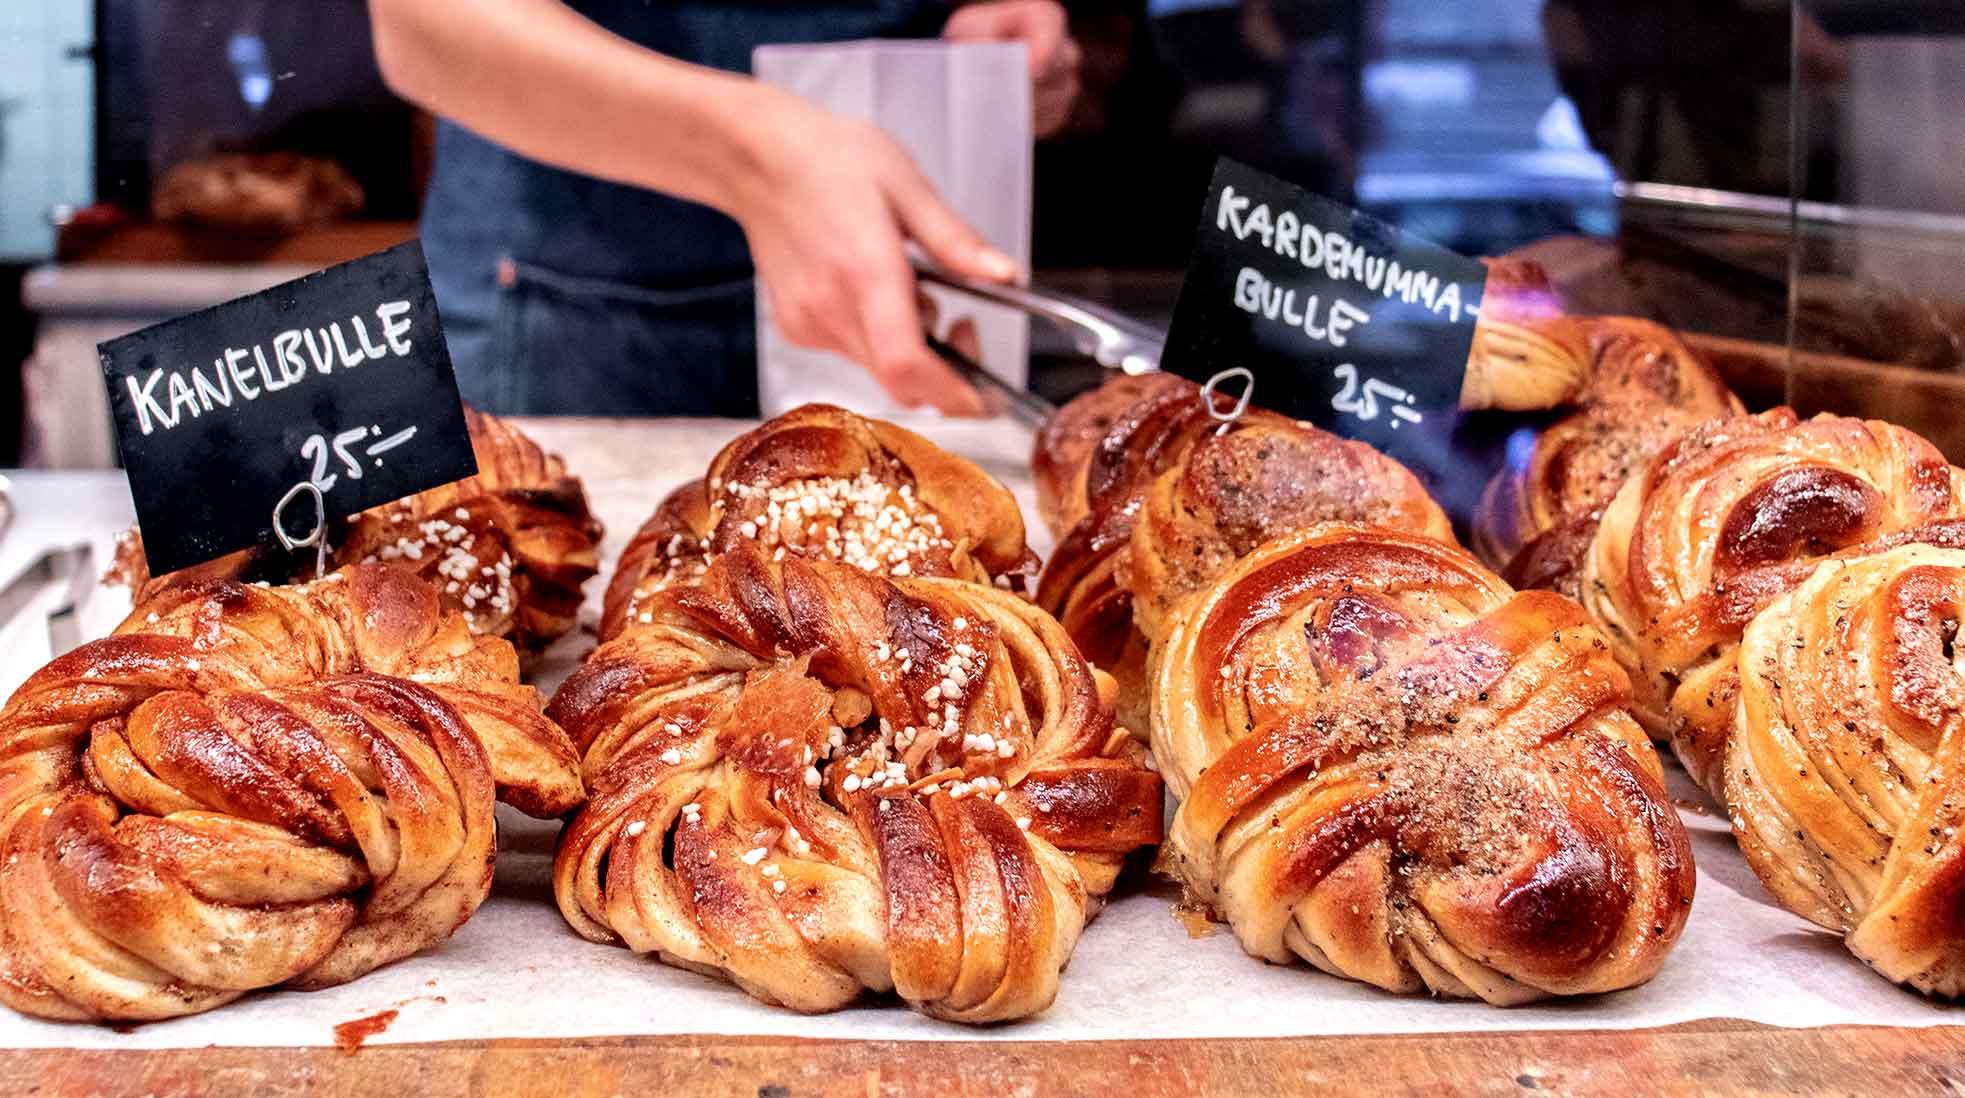 Cinnamon and cardamom rolls at a Swedish bakery. Photo: Jessica Guzik / Unsplash